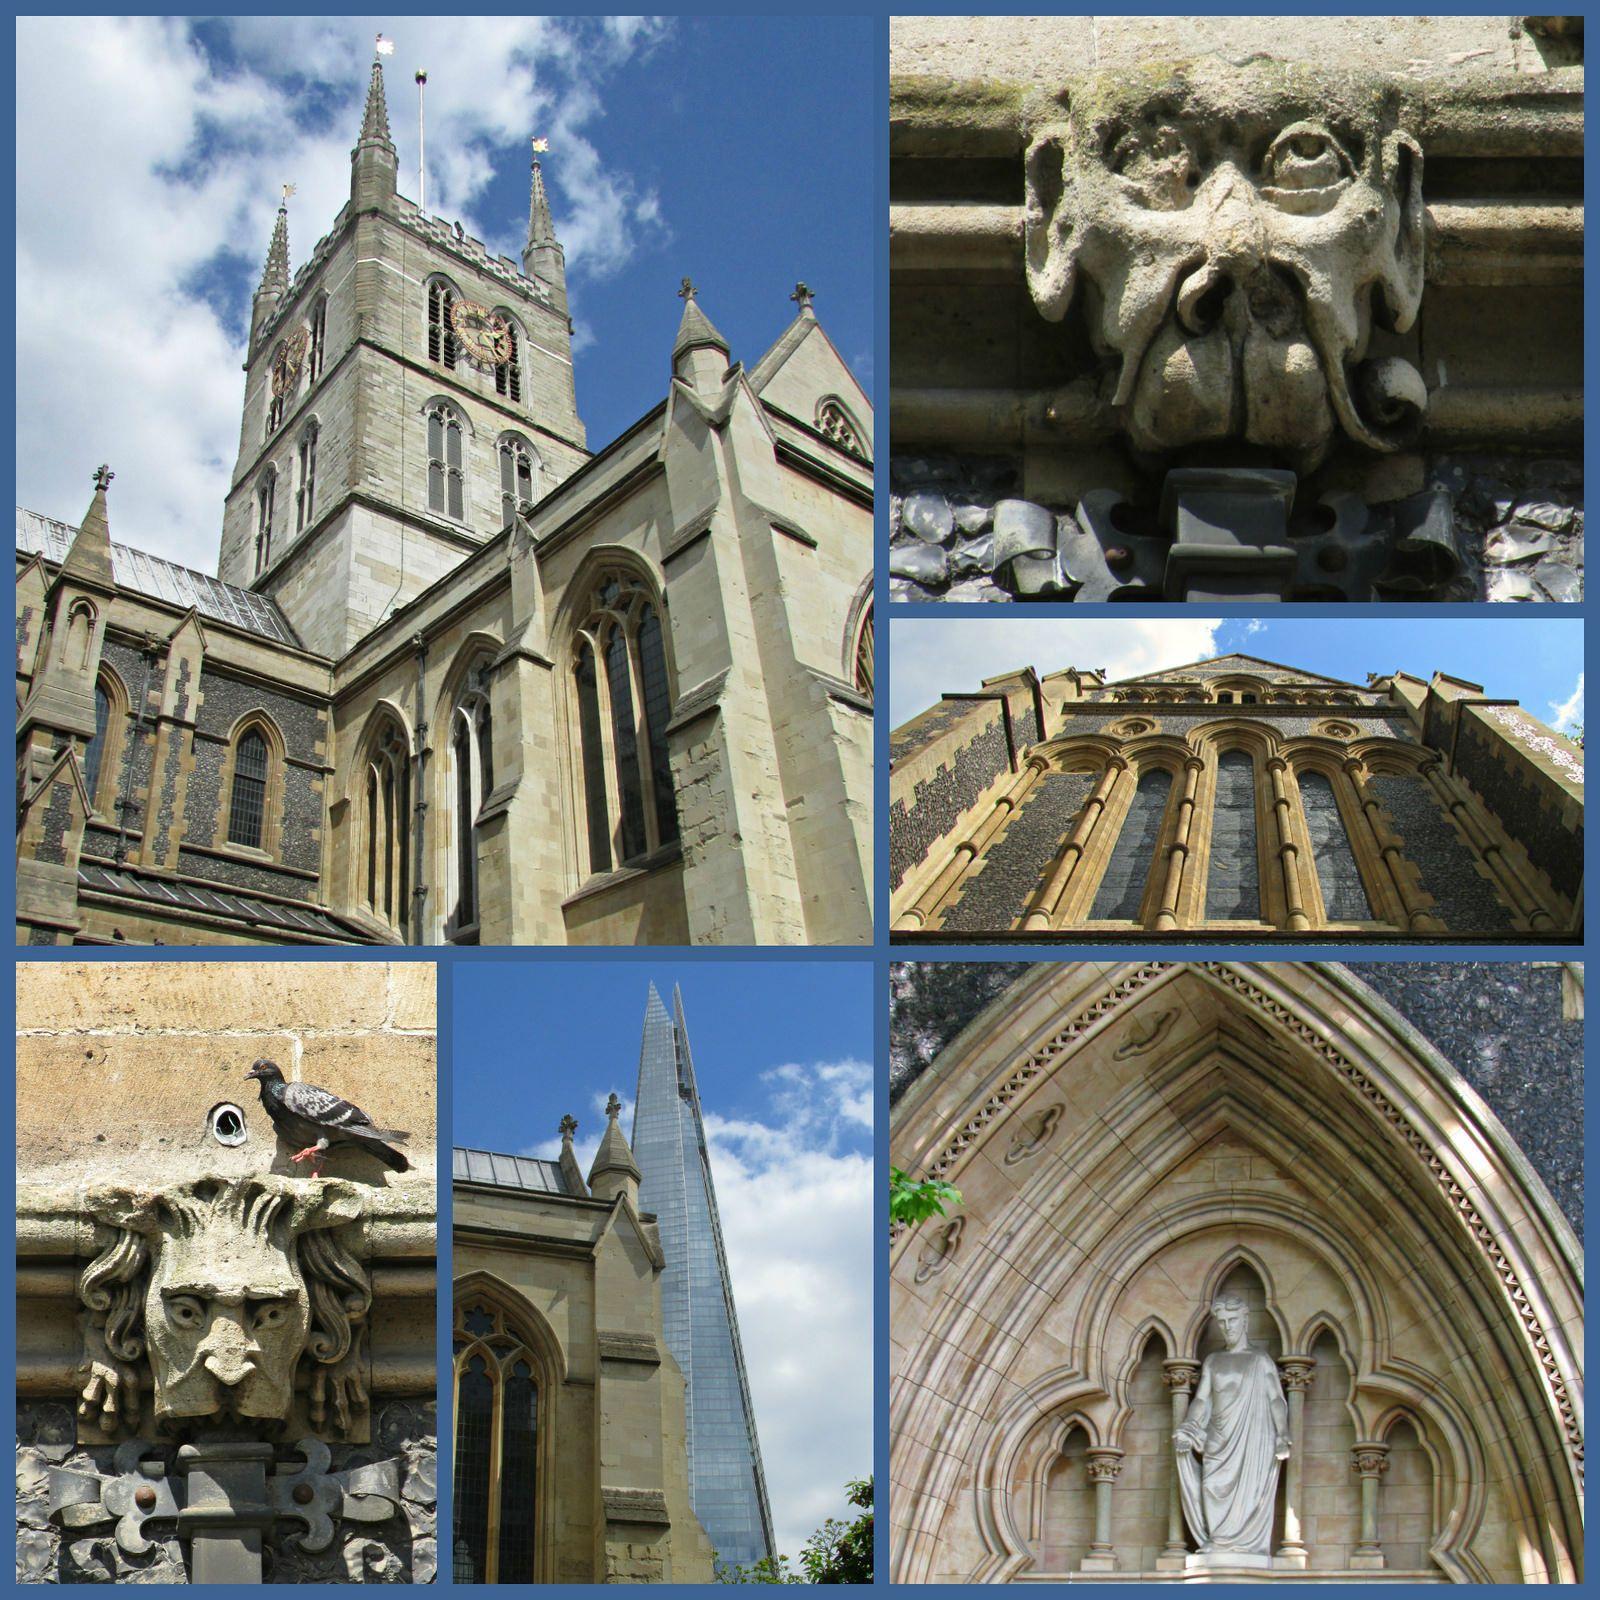 https://flic.kr/p/LZfbgw   Southwark Cathedral, London, England